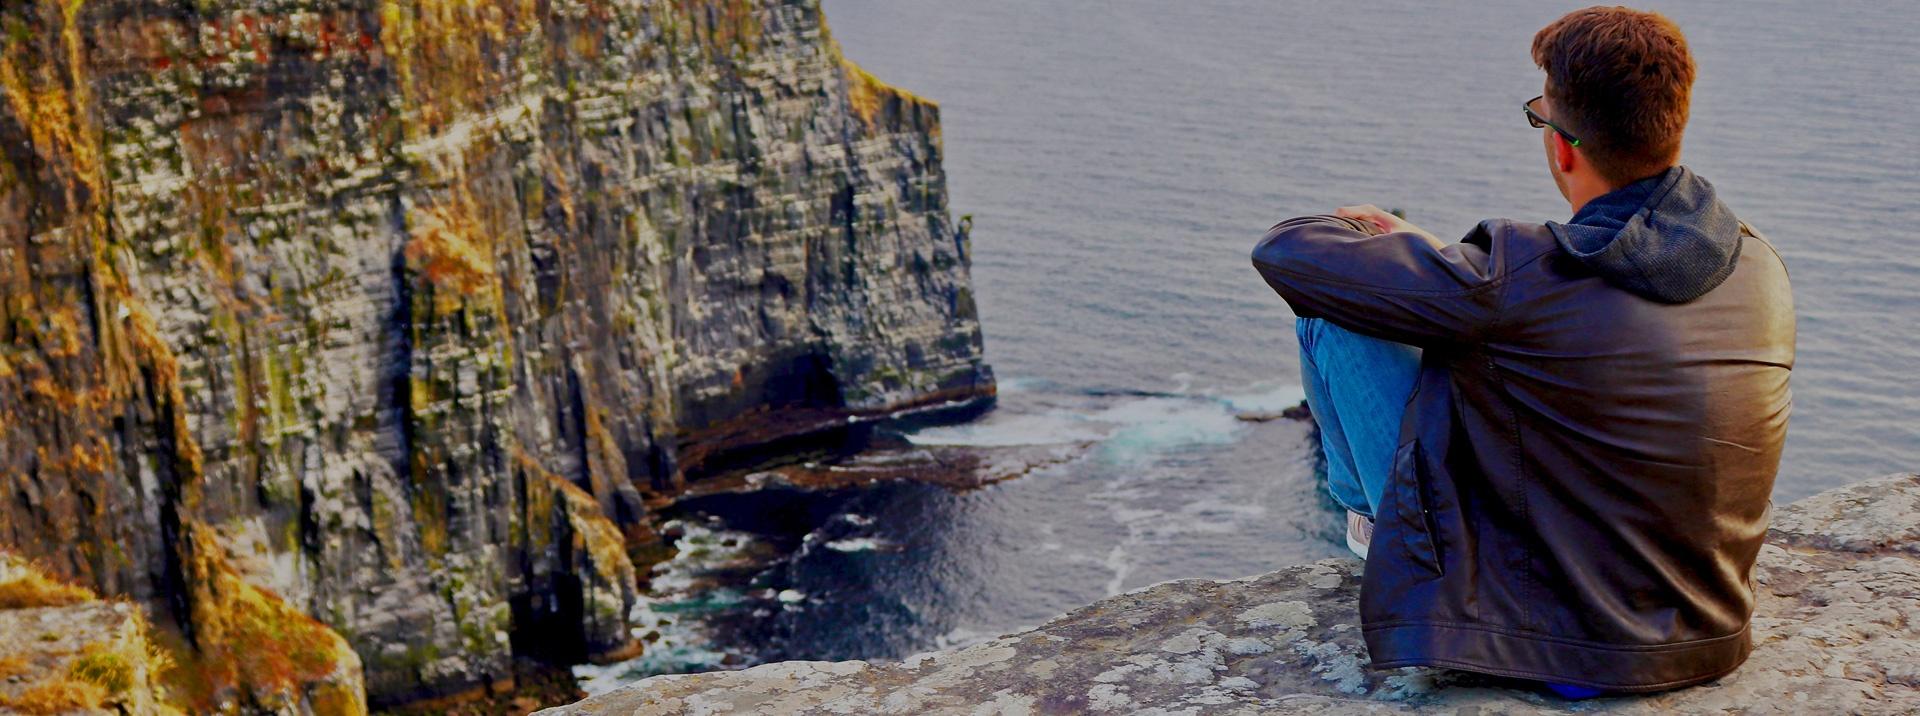 Dublin intern at Cliffs of Moher